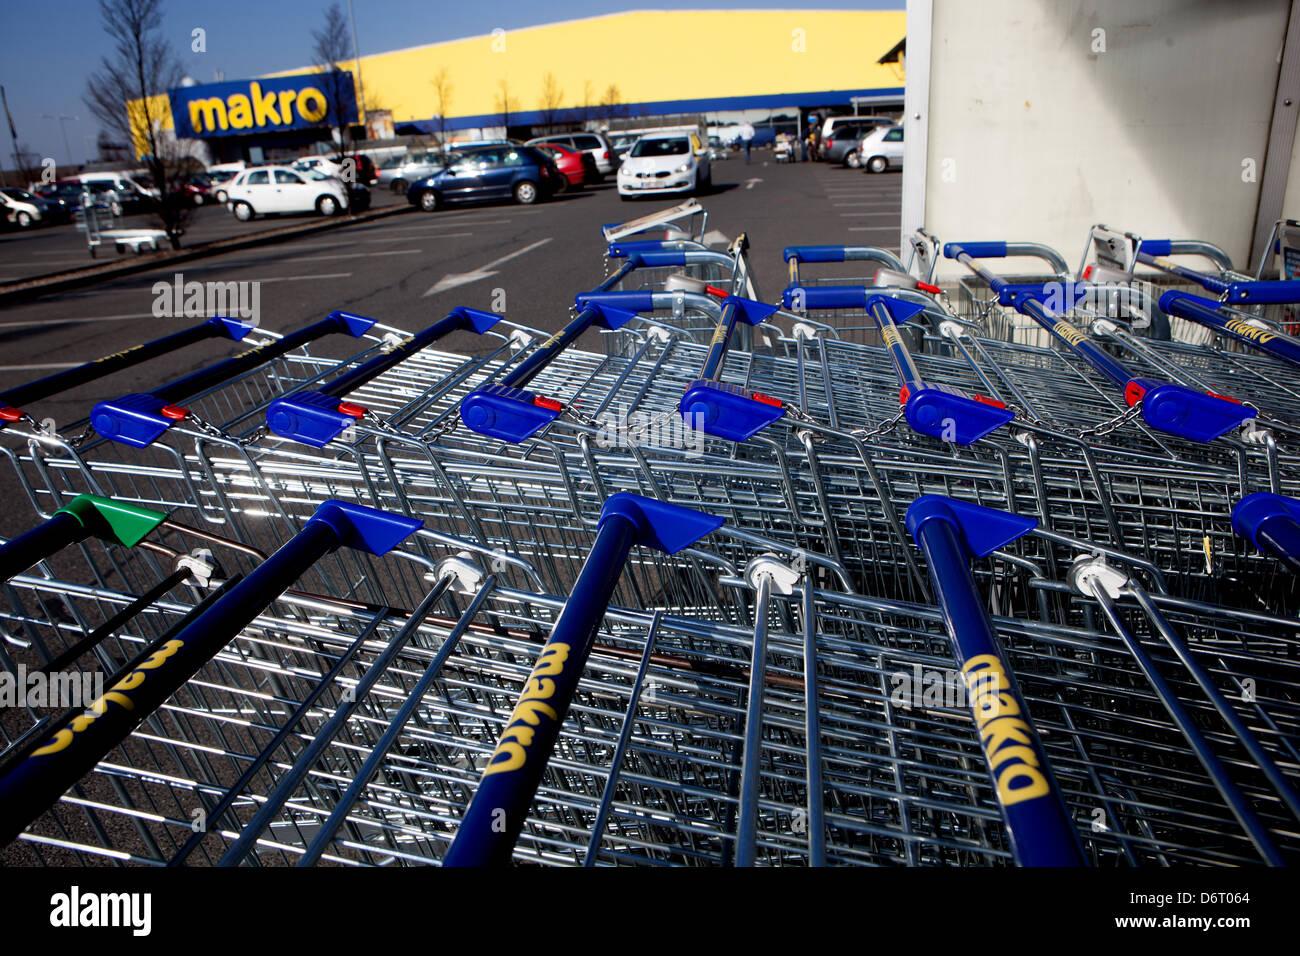 Makro store logo Prague Czech Republic supermarket - Stock Image